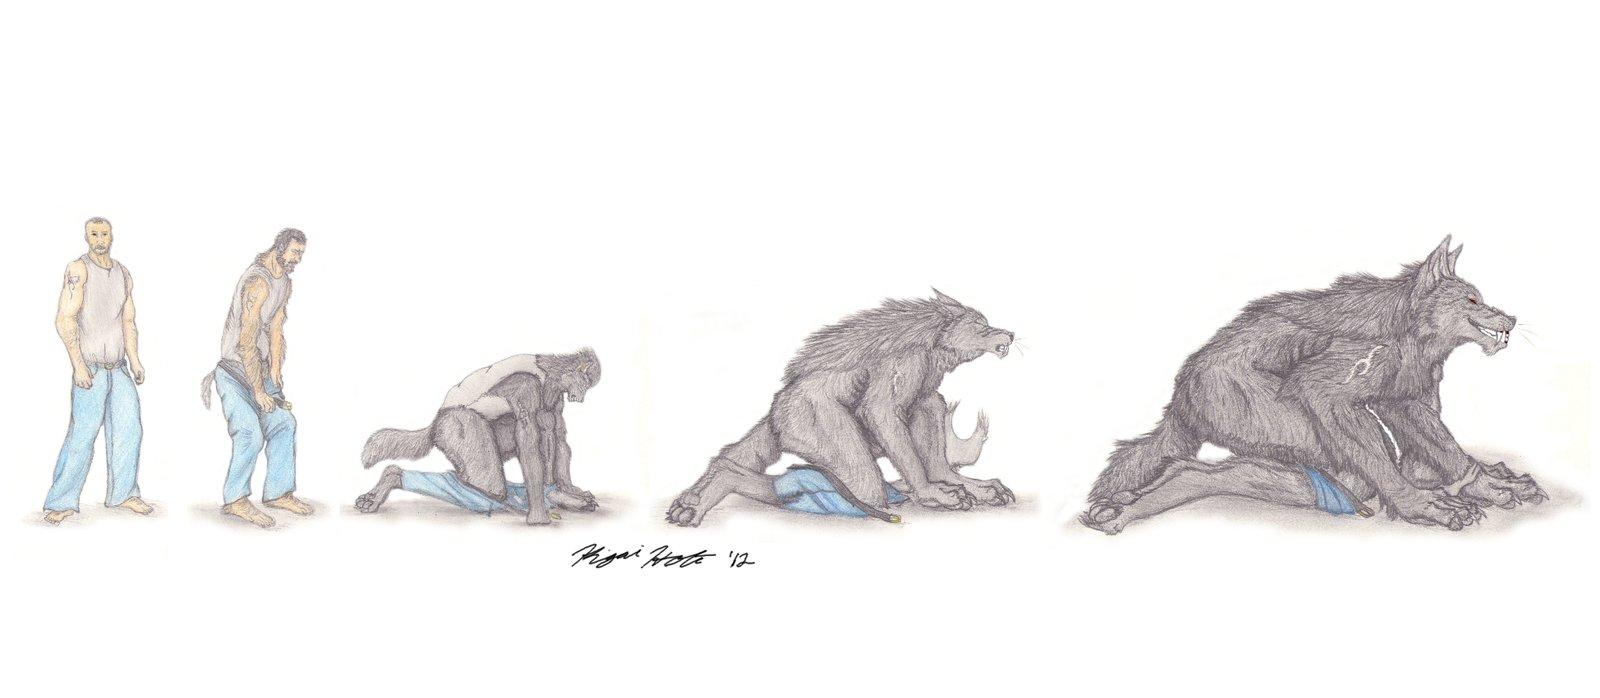 Drawn wolfman rage 24 Kigai Wolf Kigai Sequence